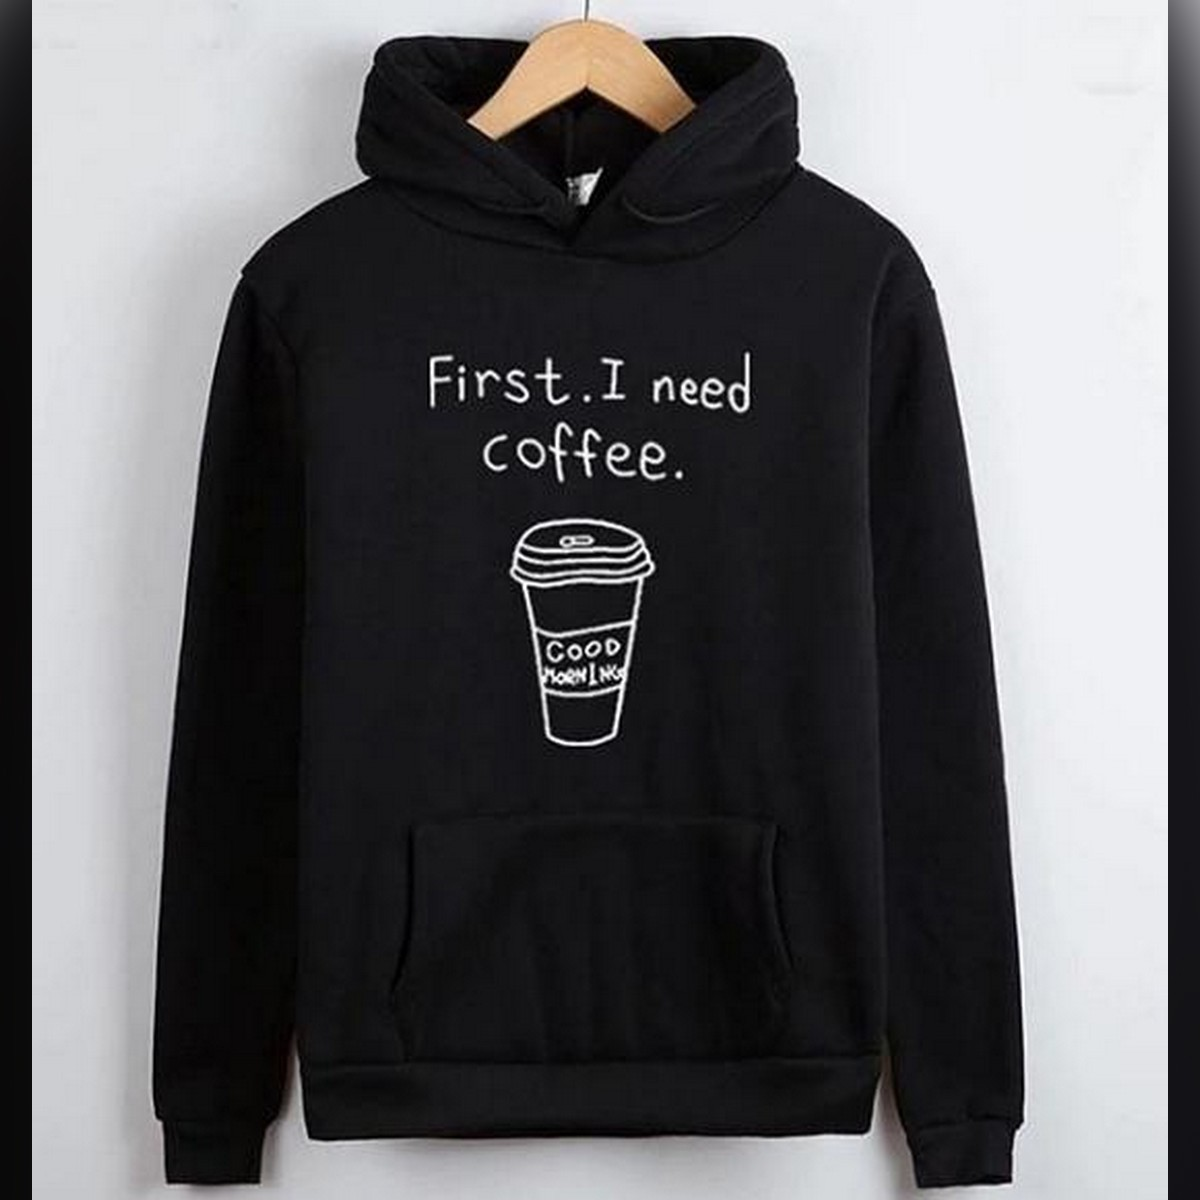 Black Fleece I Need Coffee Hoodie Style Hoodie For Women